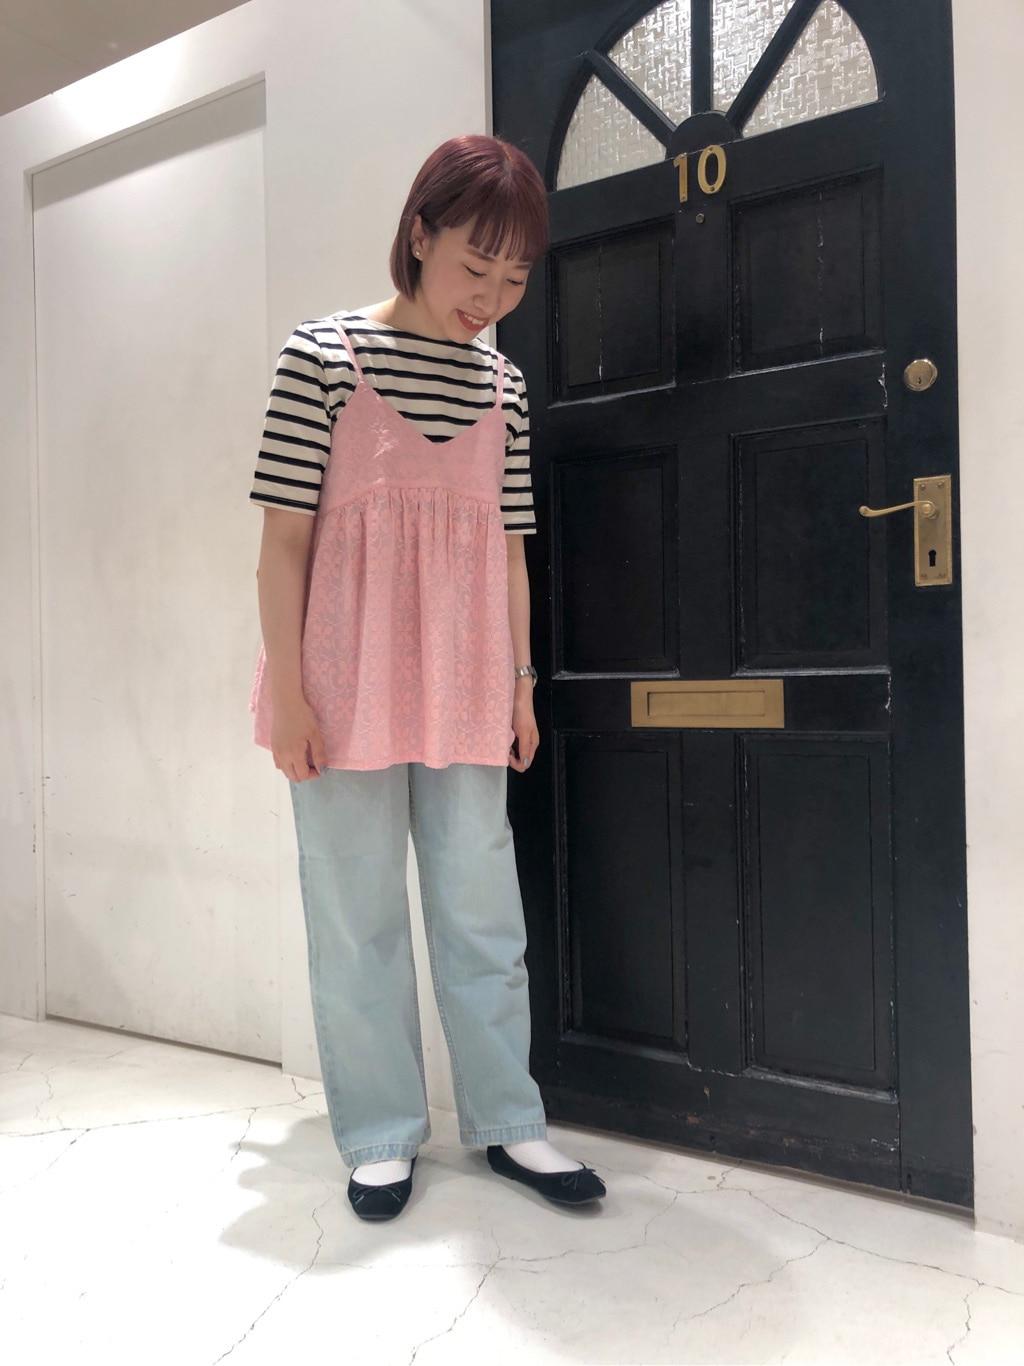 Dot and Stripes CHILD WOMAN ルクアイーレ 身長:157cm 2021.06.10